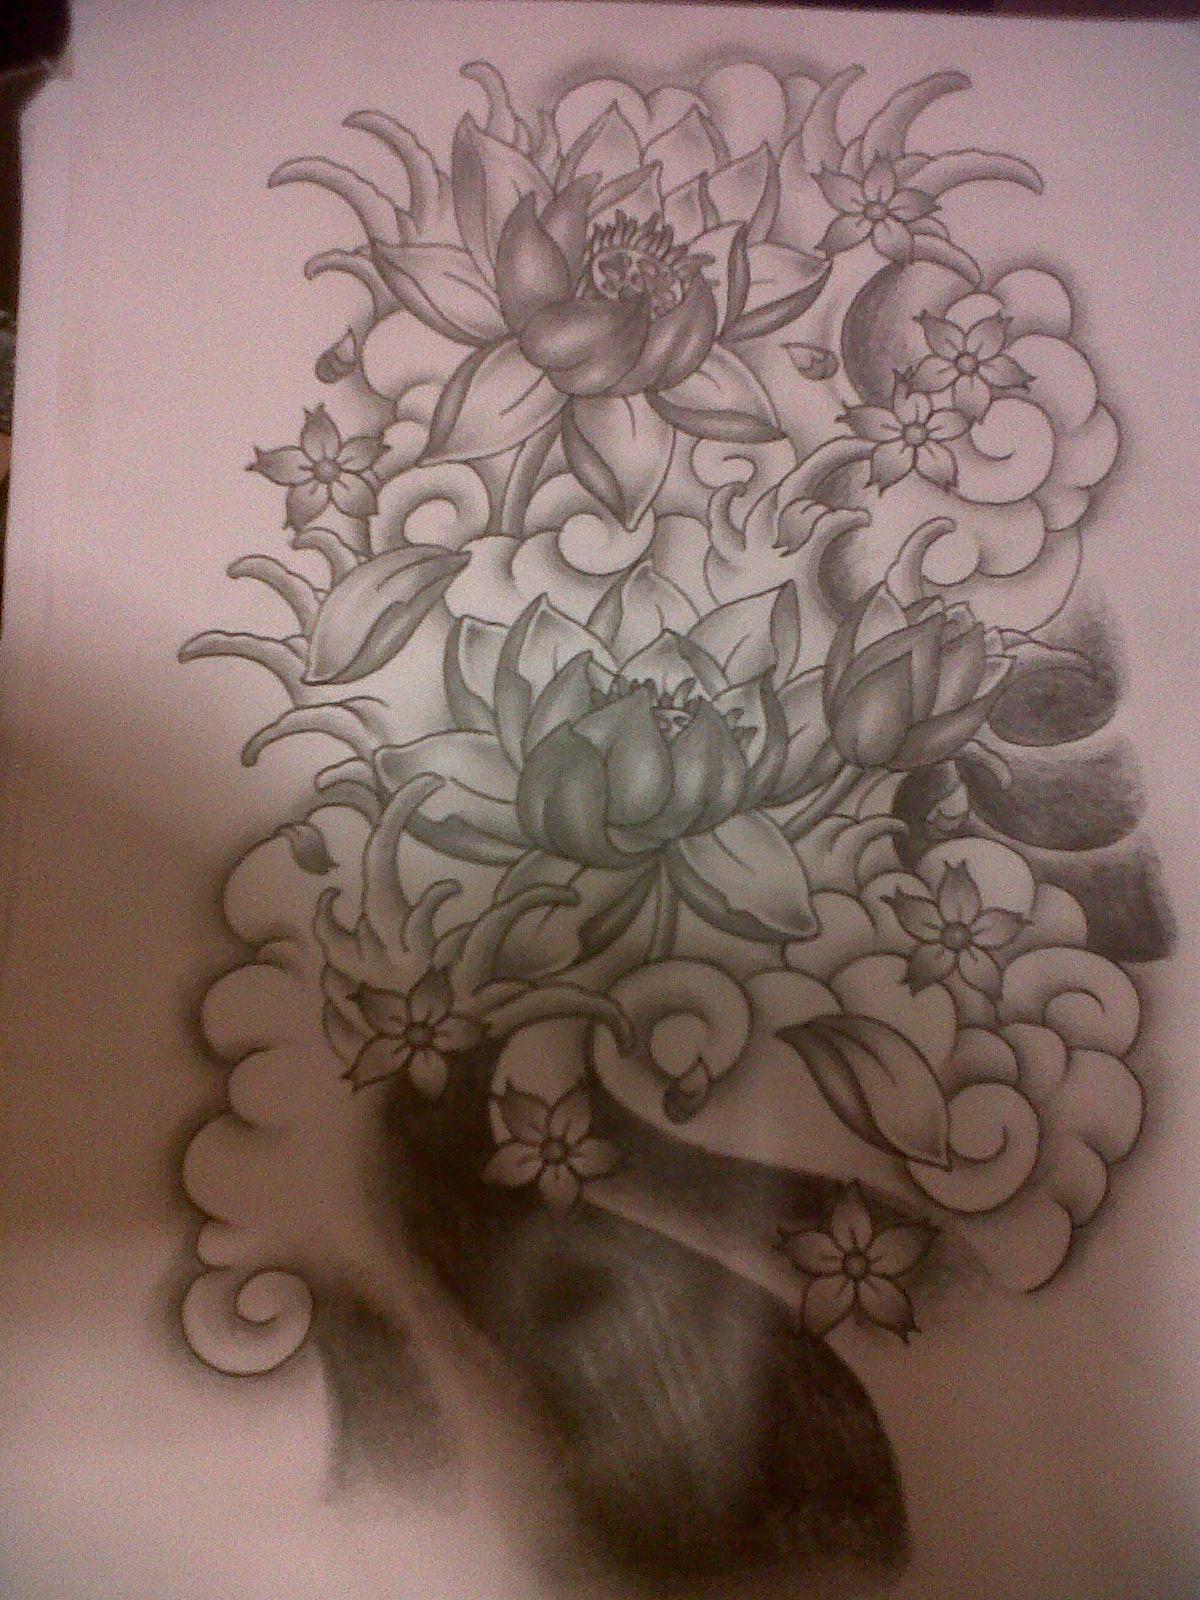 japanese flowers tattoo design by tattoosuzette on DeviantArt